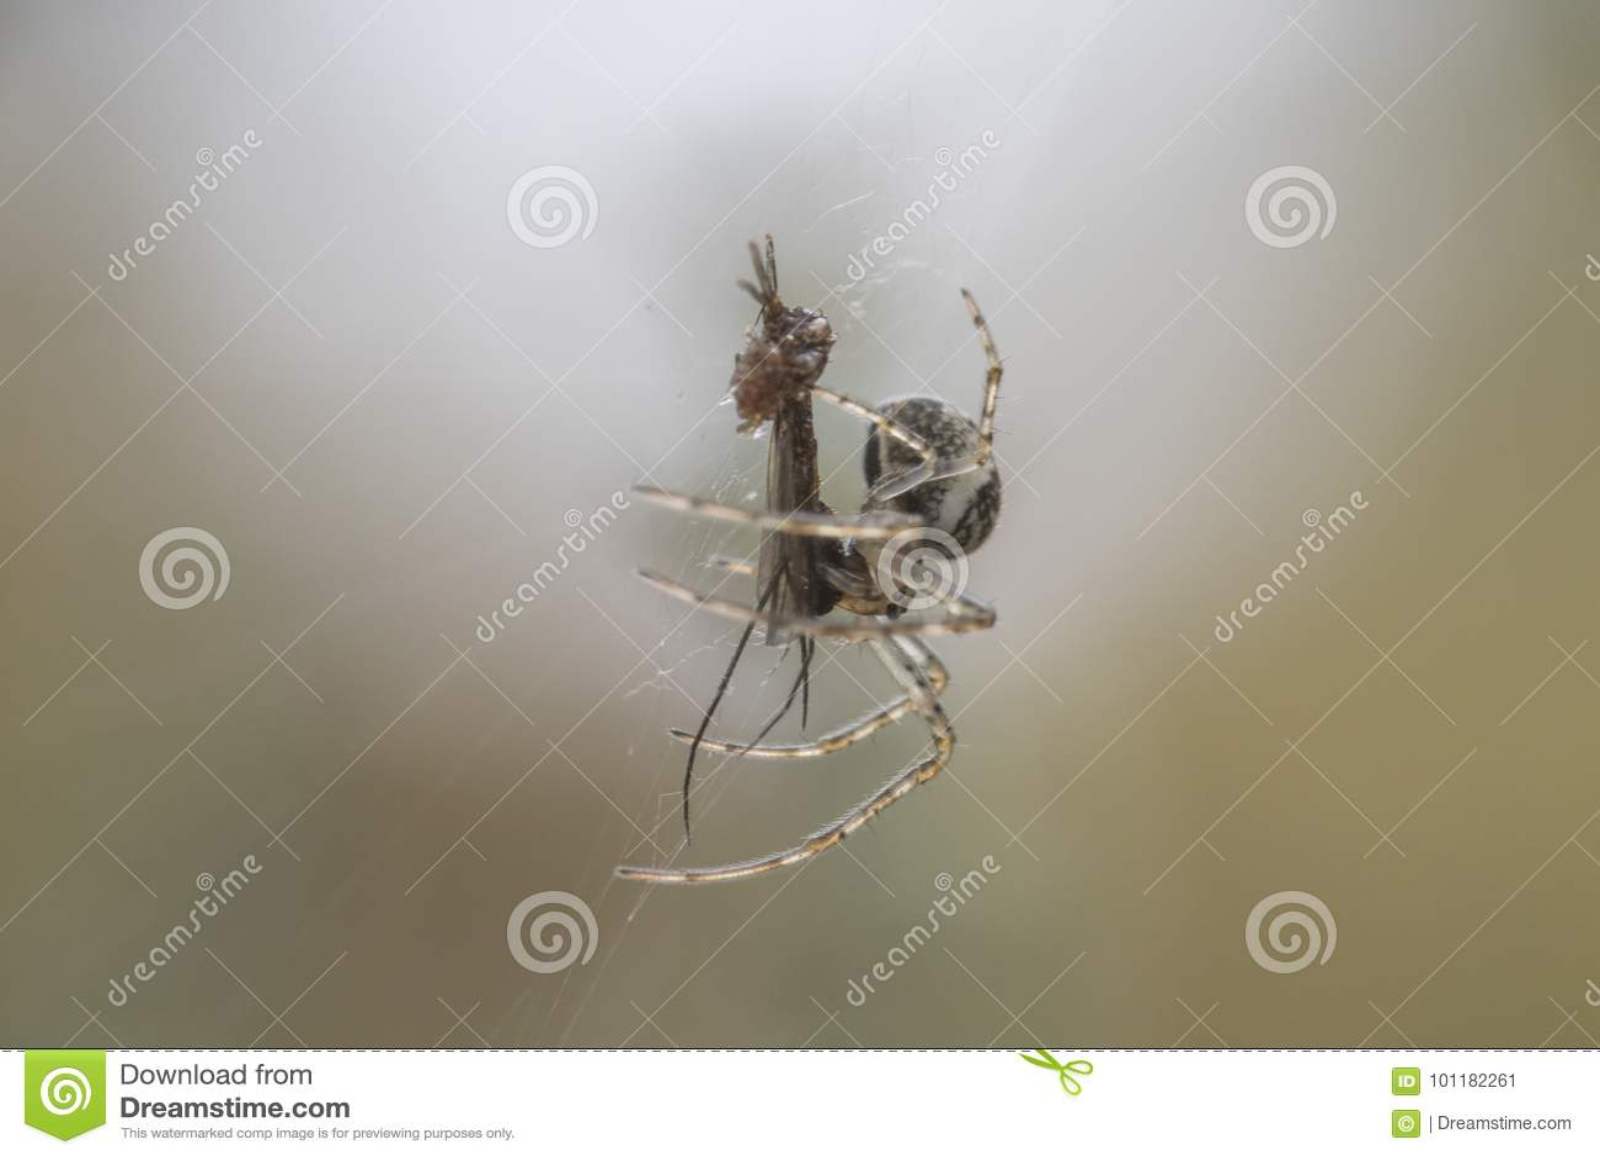 Small money spider on web